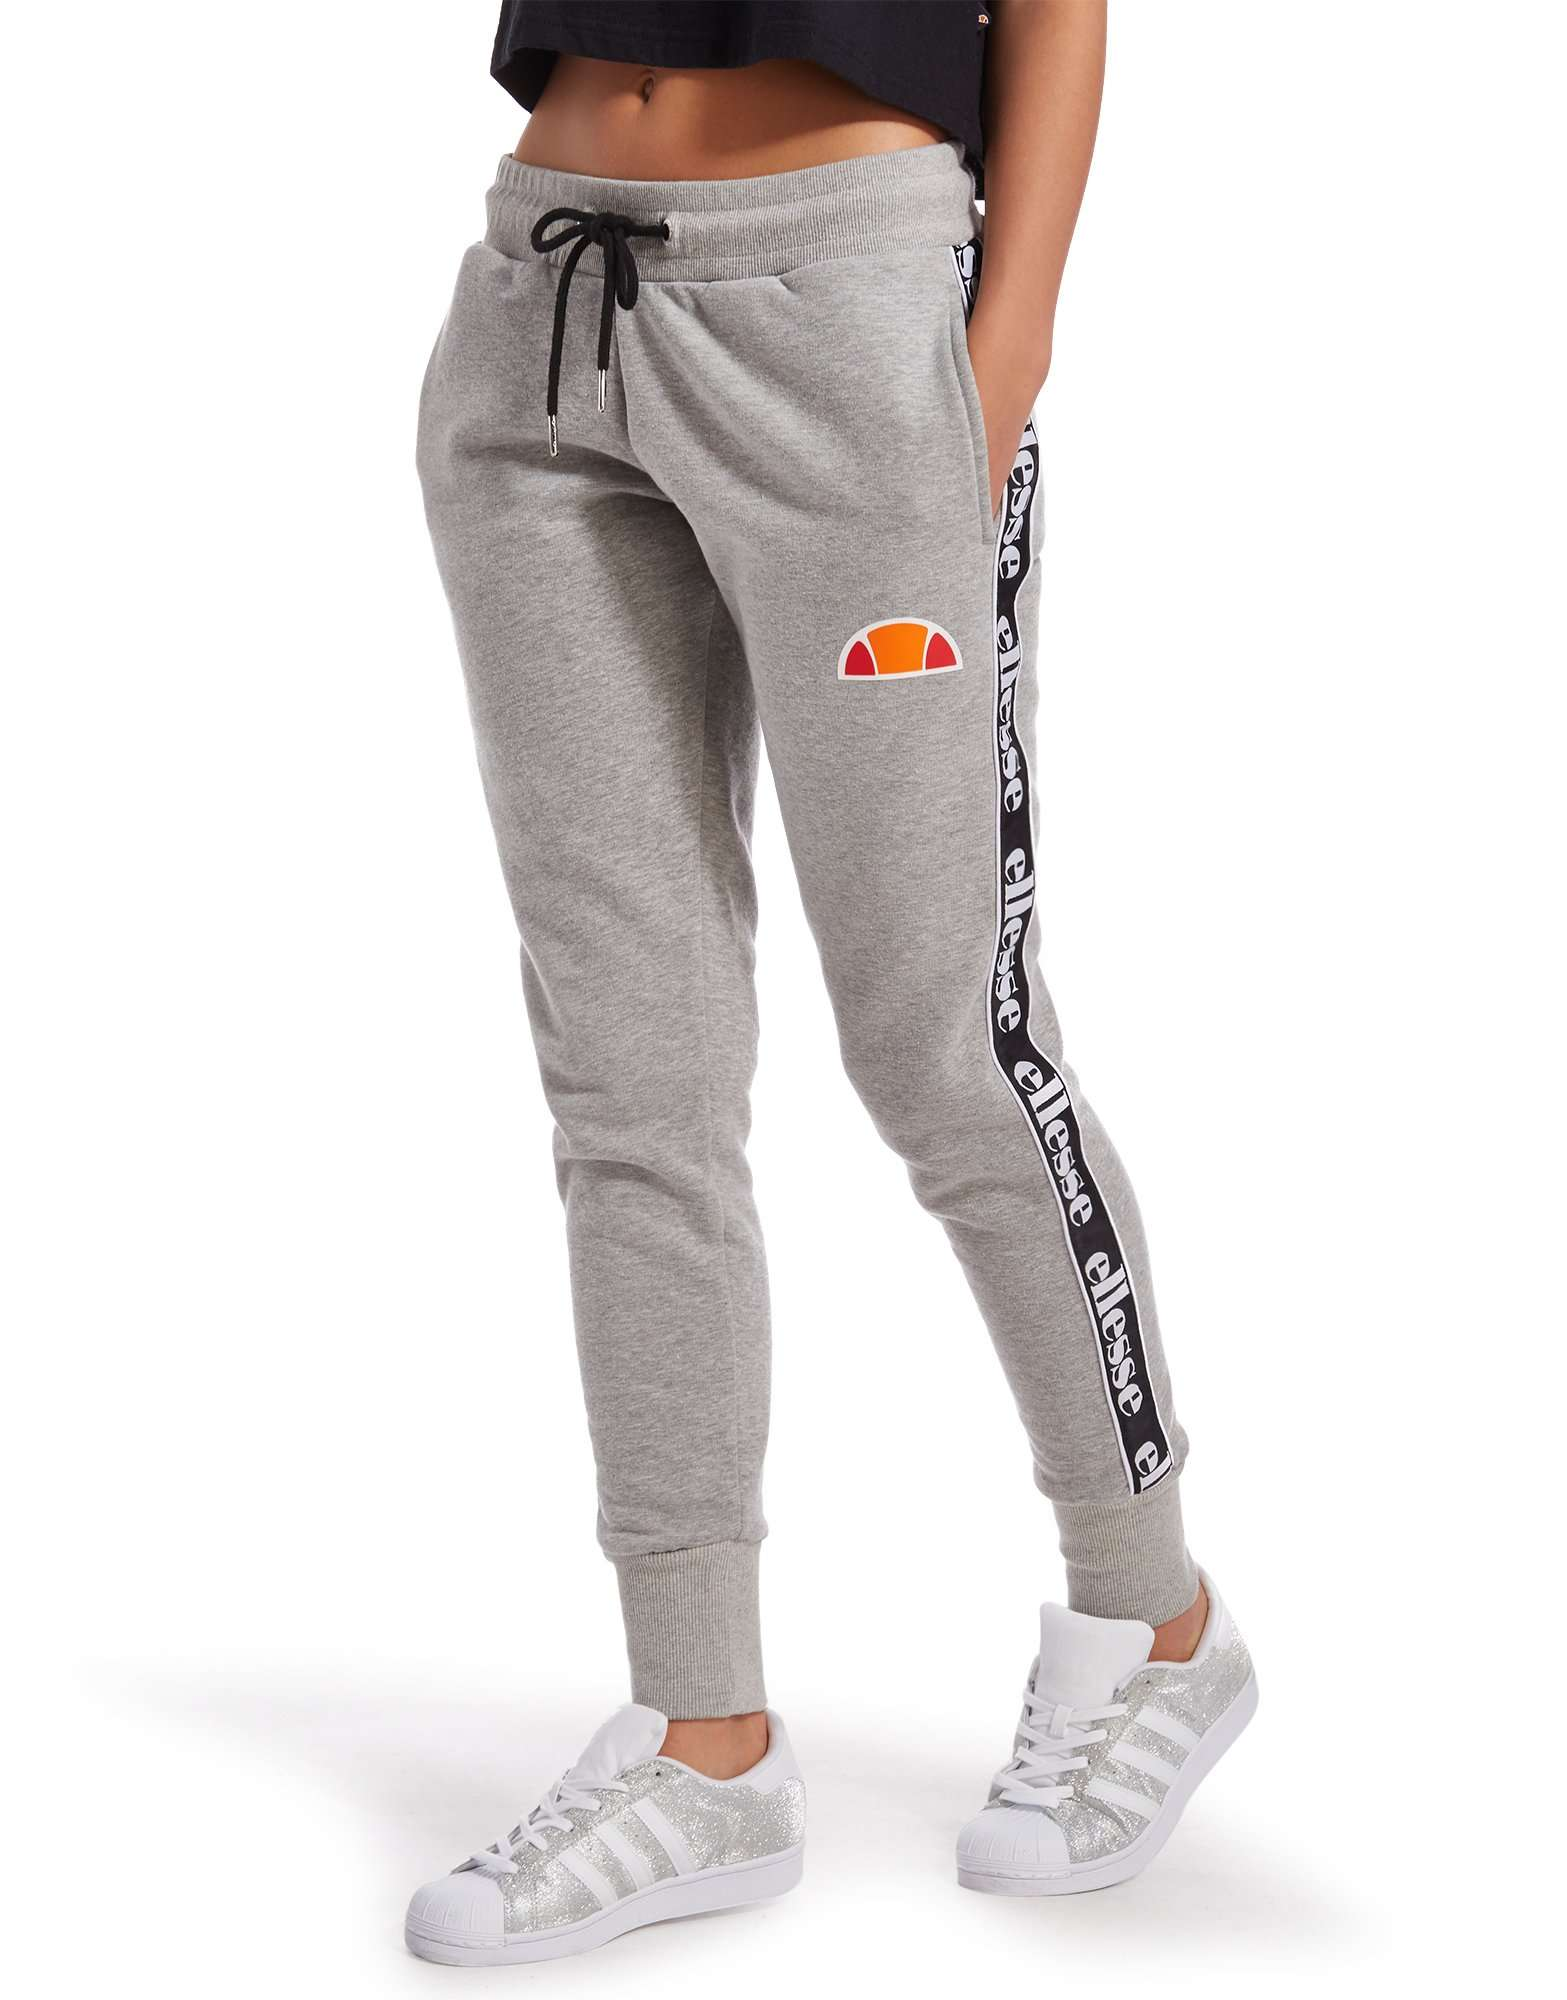 Cool BRINK Women Melange Grey Track Pants